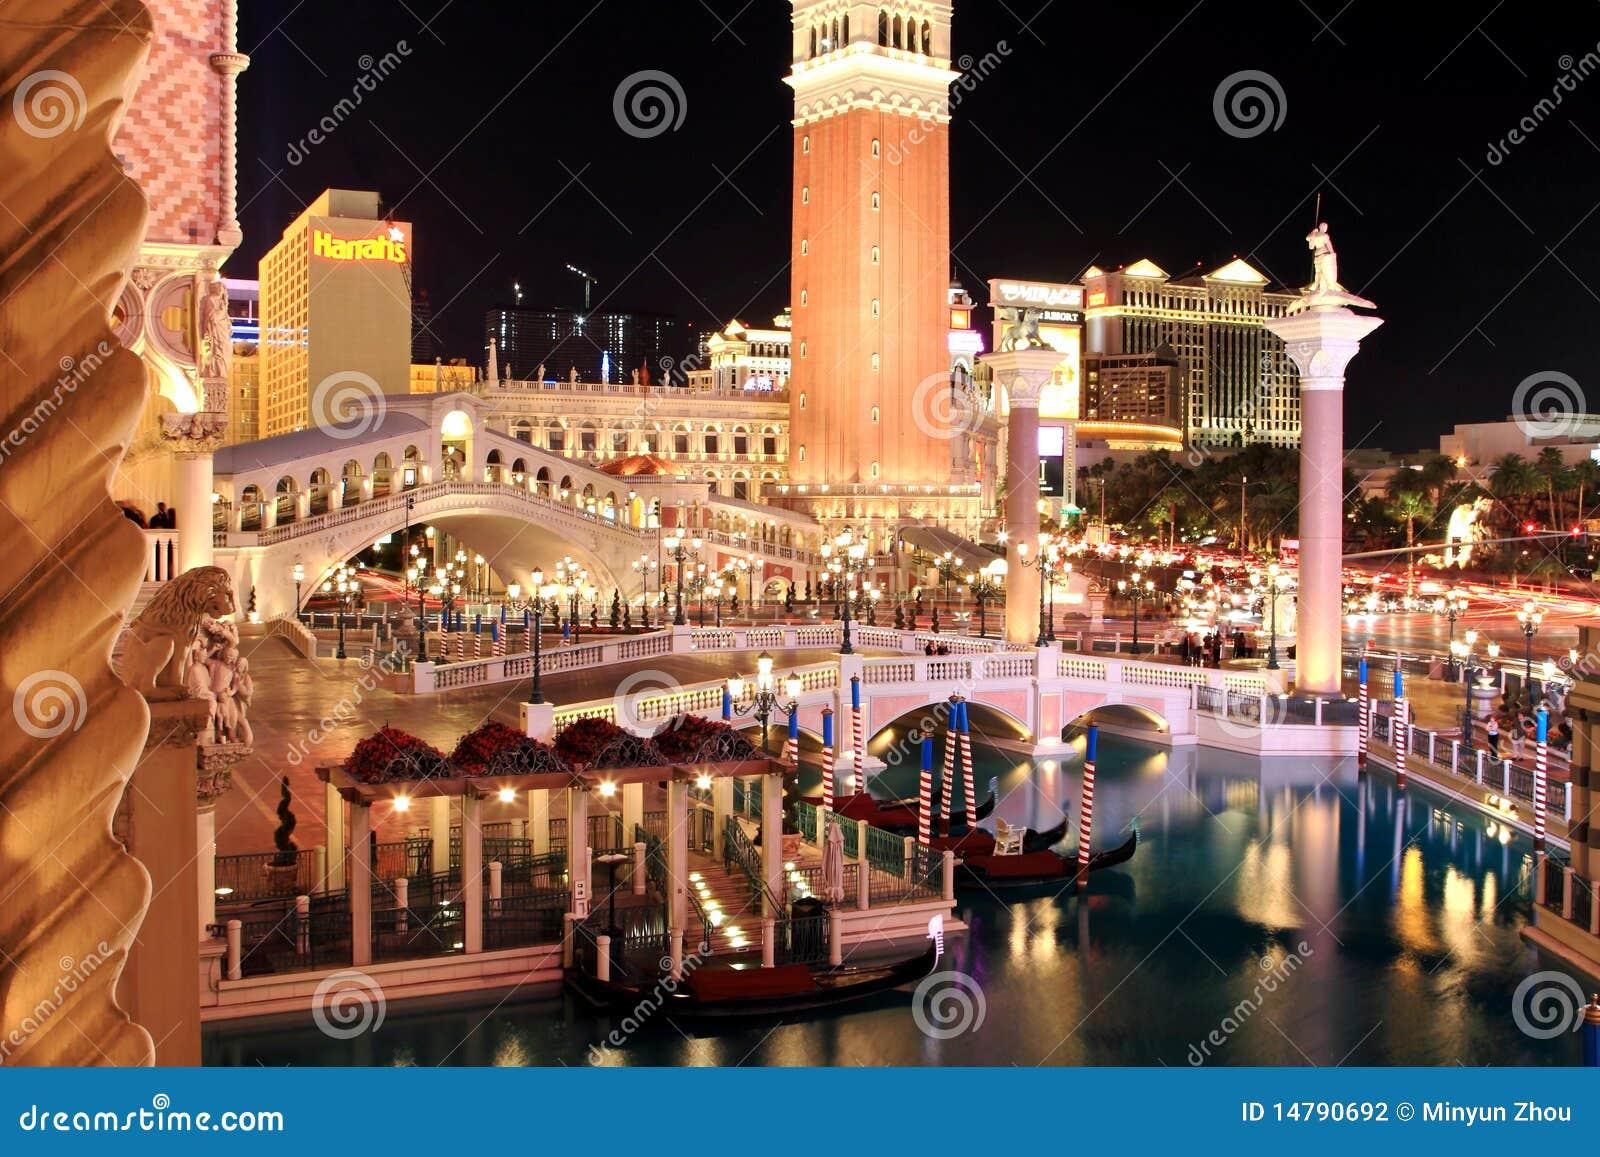 Venetian Hotel Las Vegas Prices